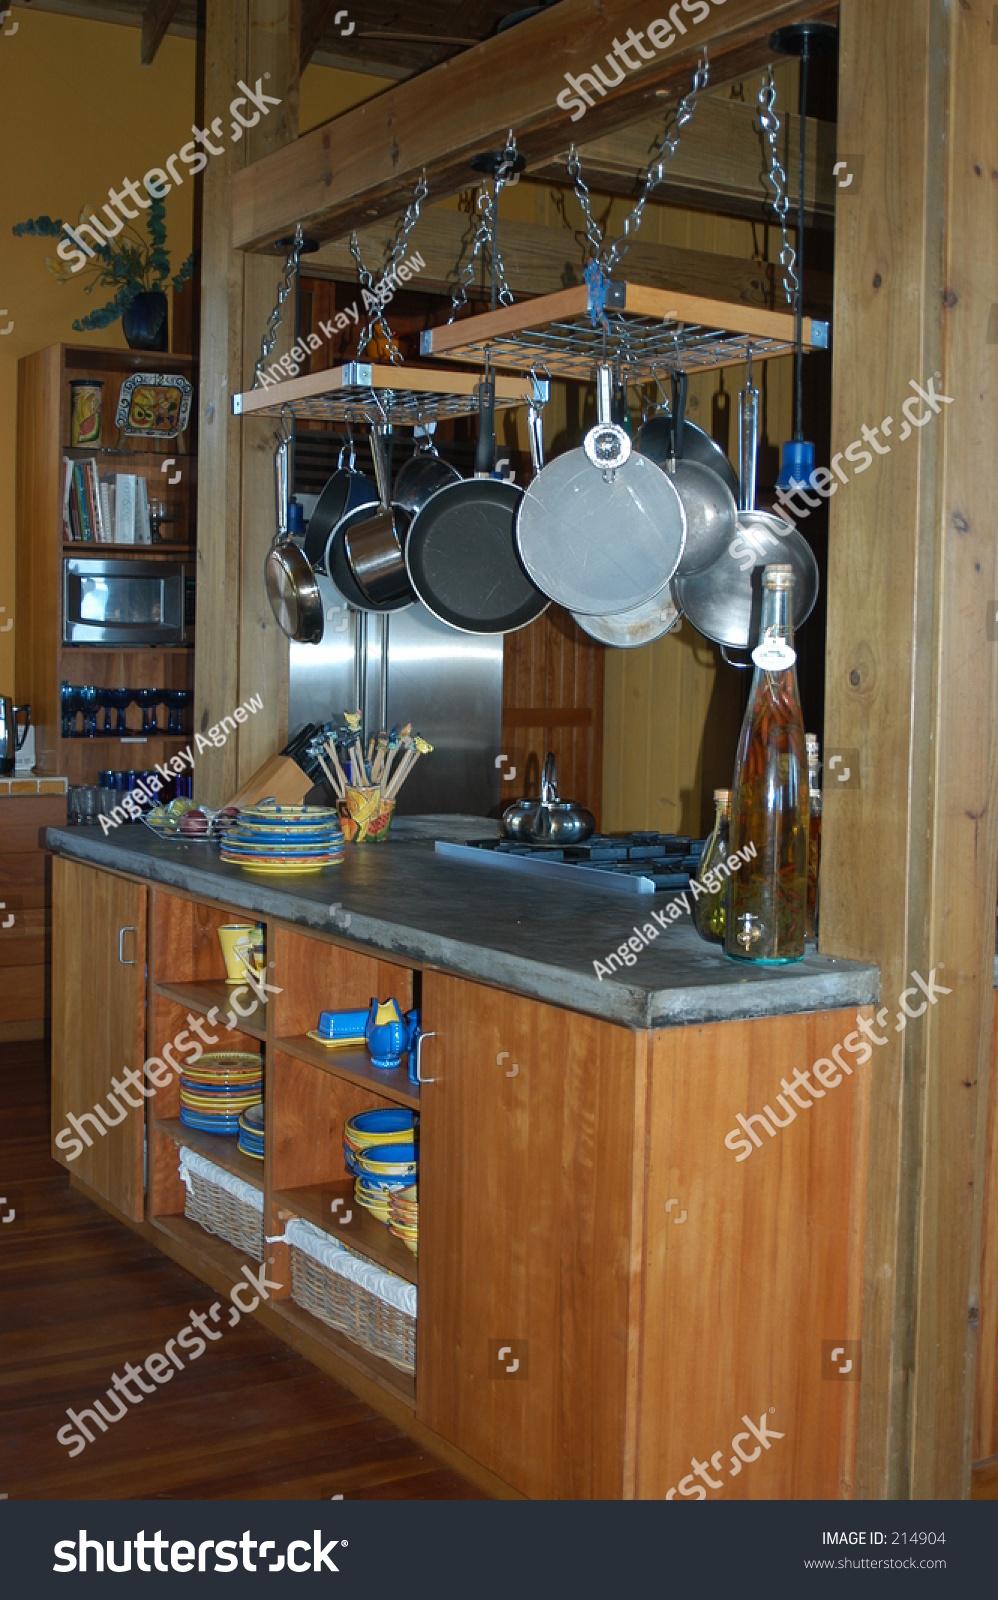 Kitchen Counter Stock Photo 214904 Shutterstock